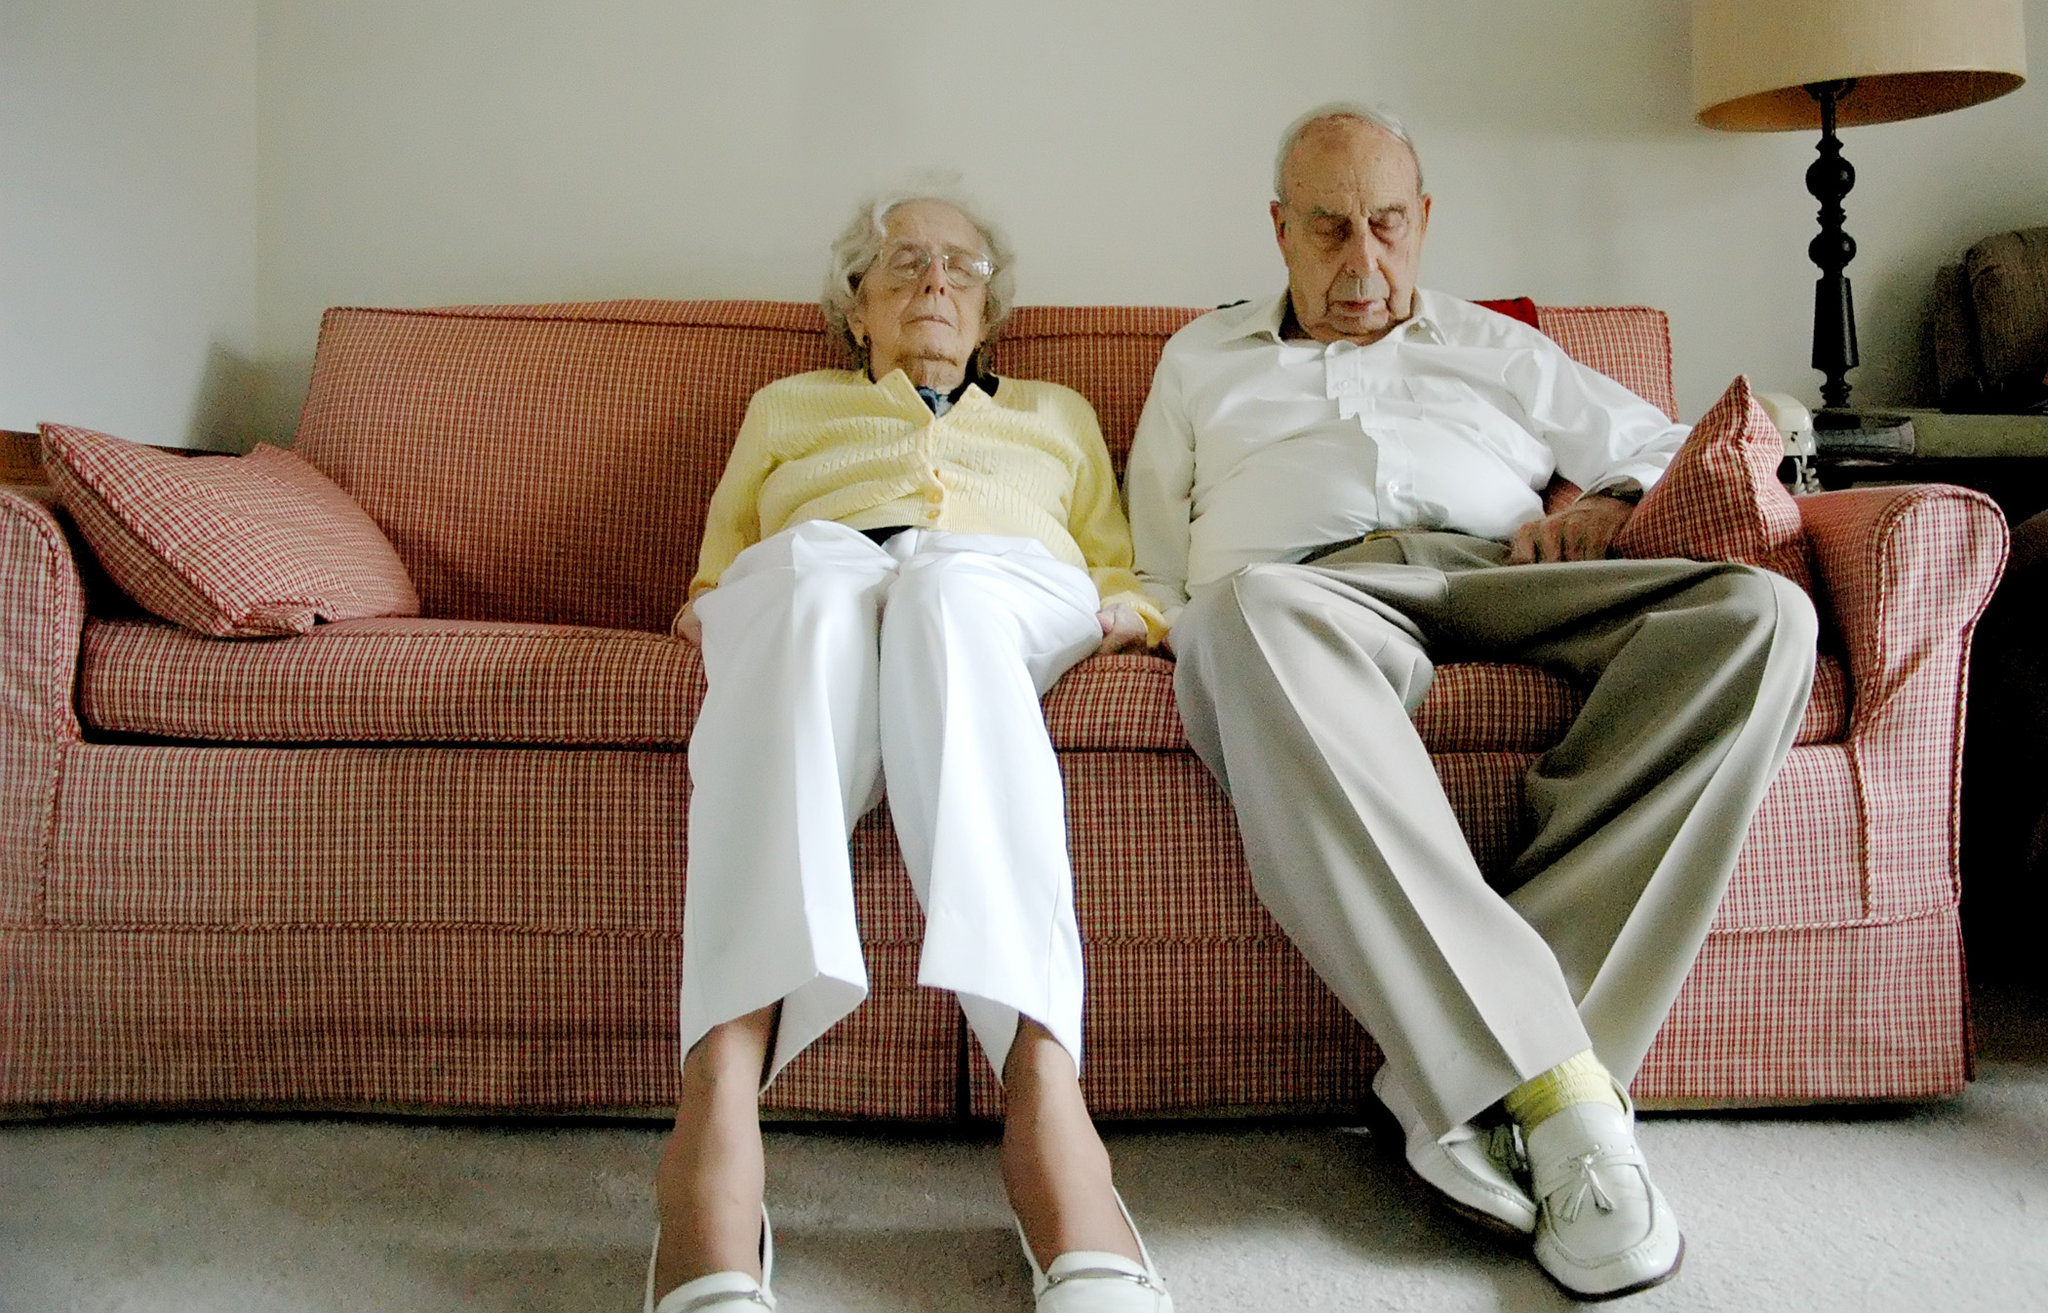 Care Quotes Elderly Parents Taking